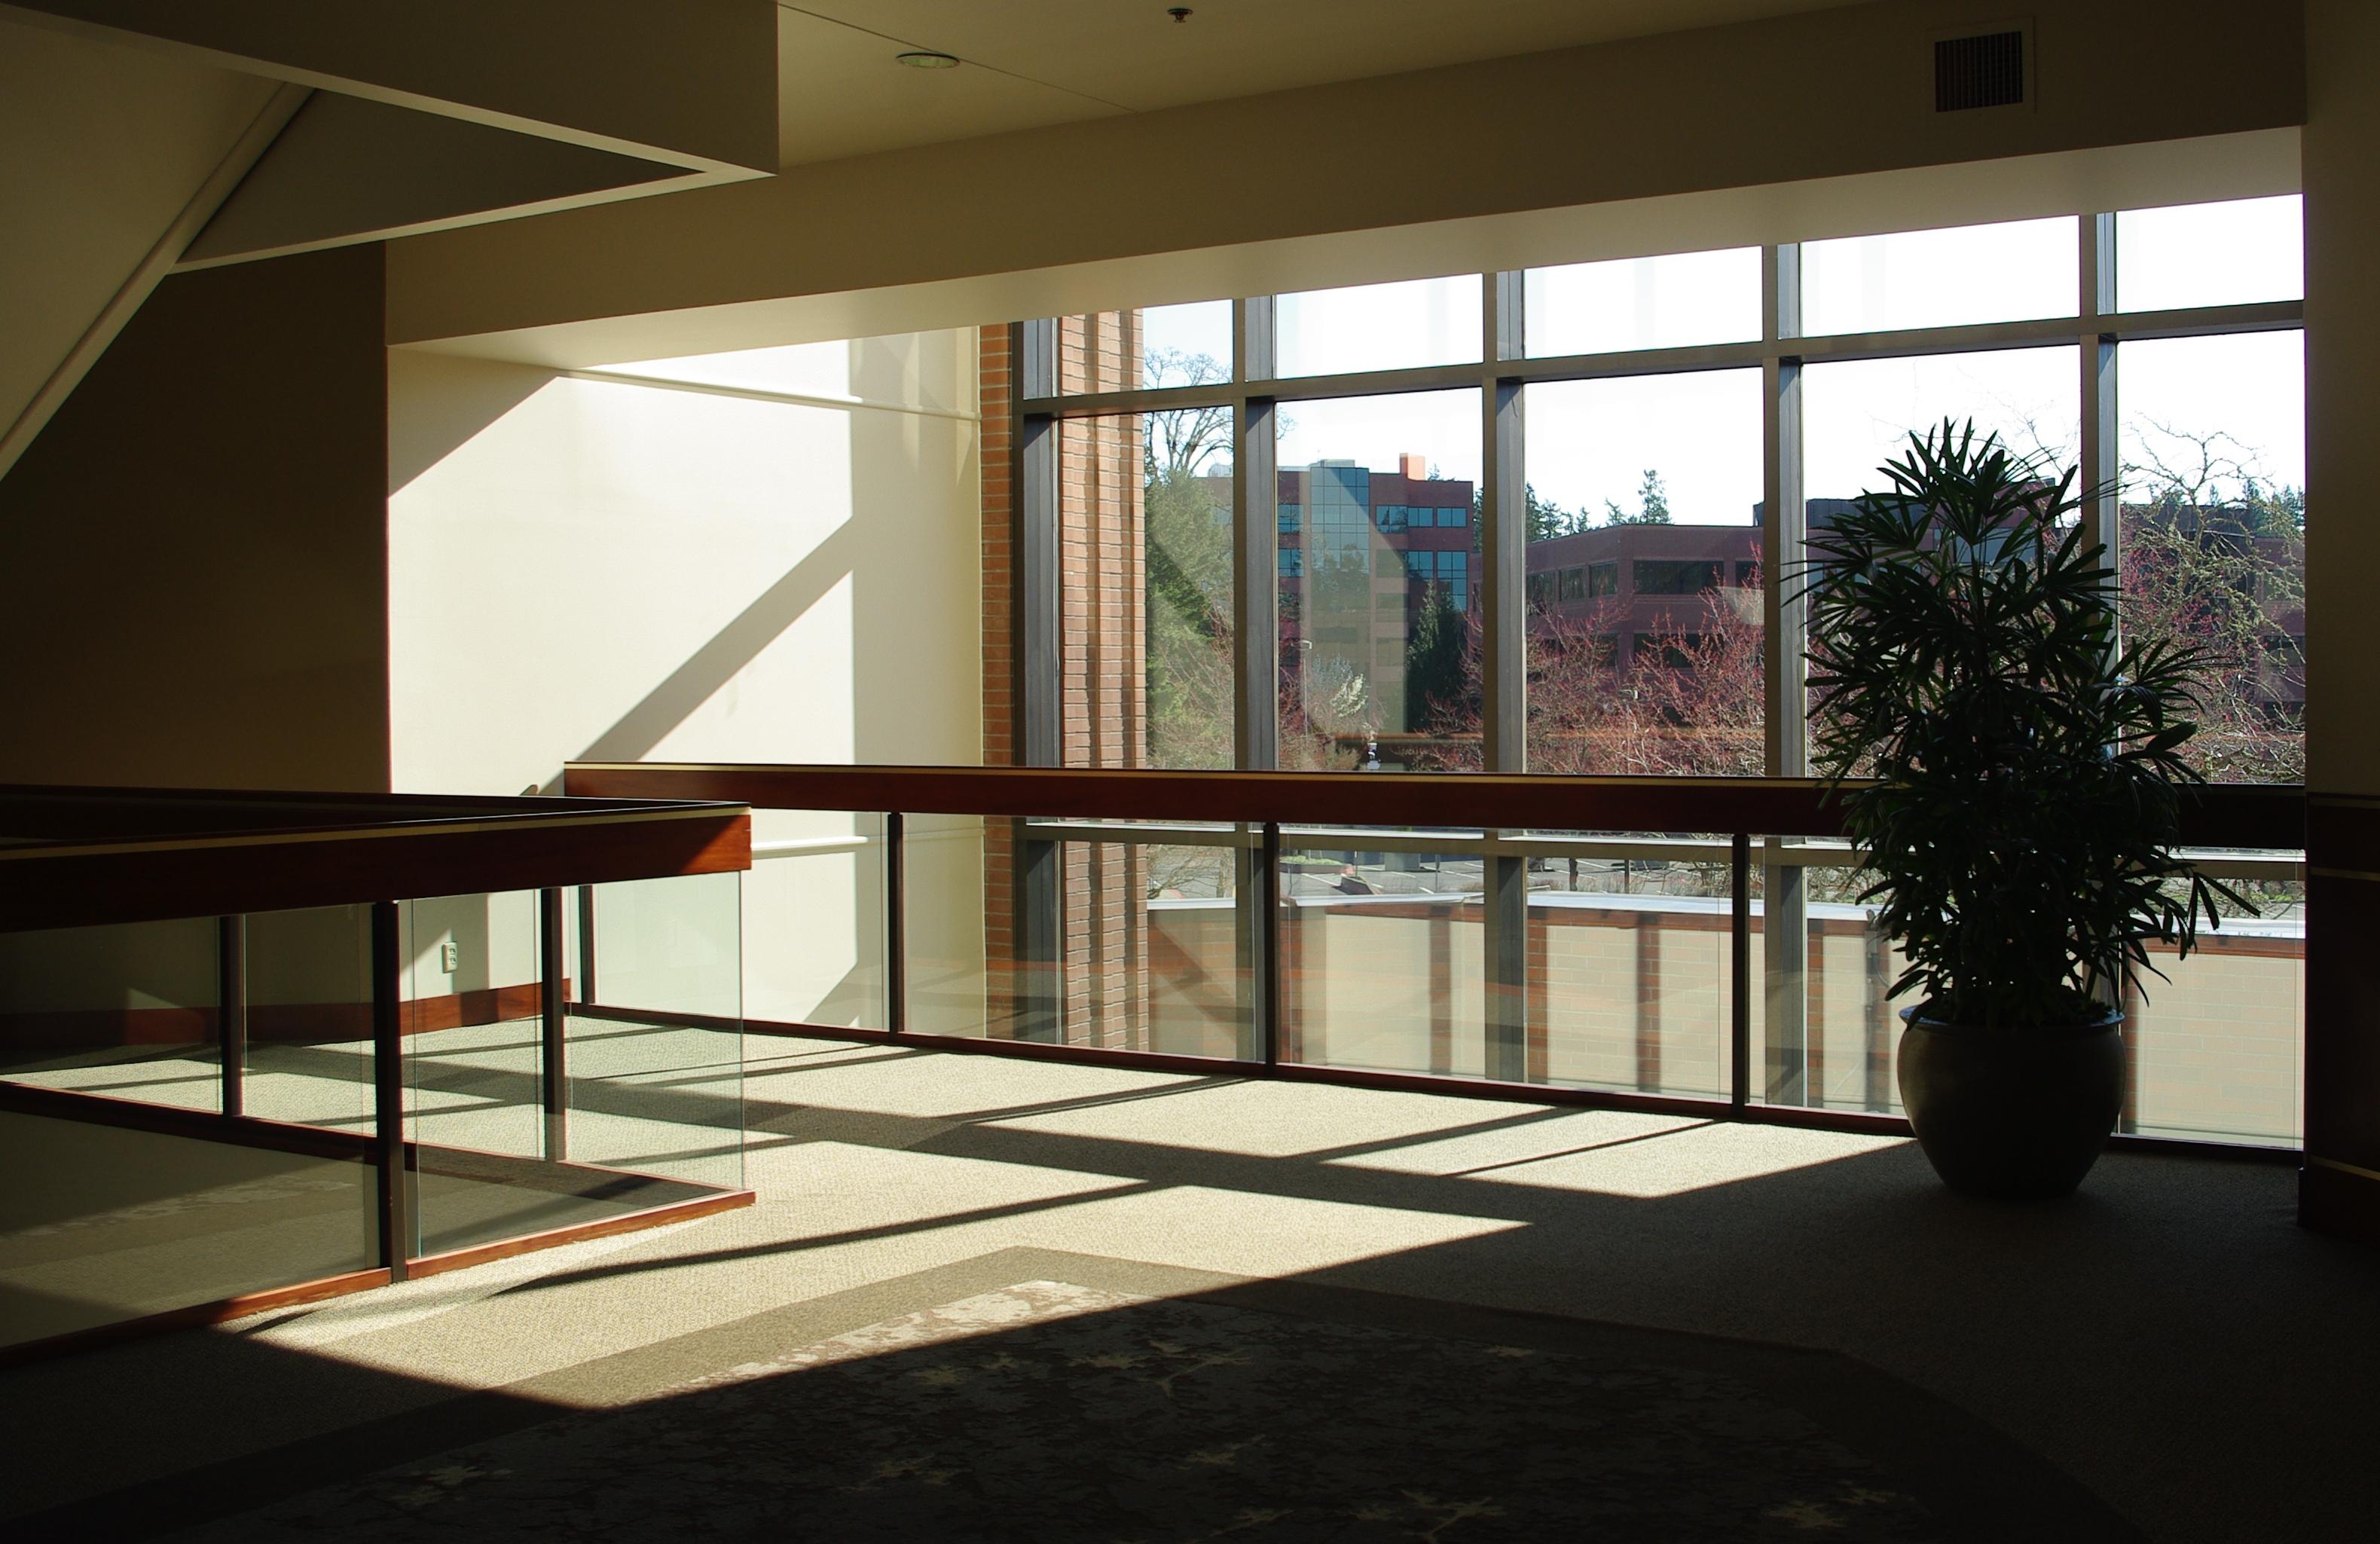 Lake Oswego Building Department